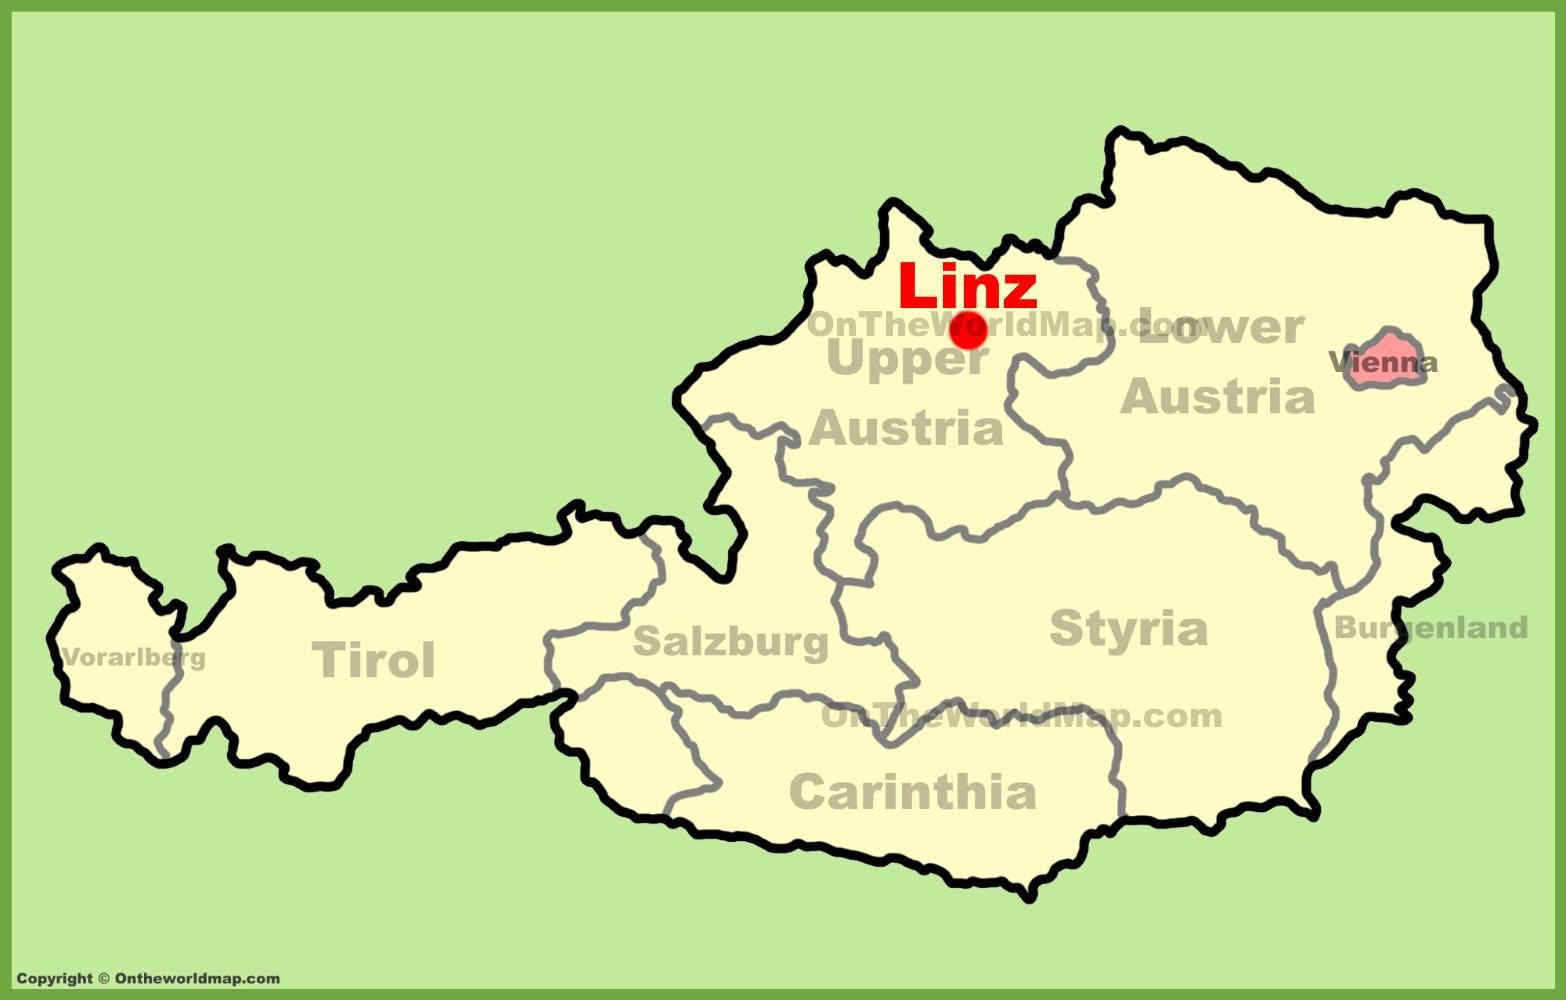 Linz Austria Map Linz austria map   Map of linz austria (Western Europe   Europe)